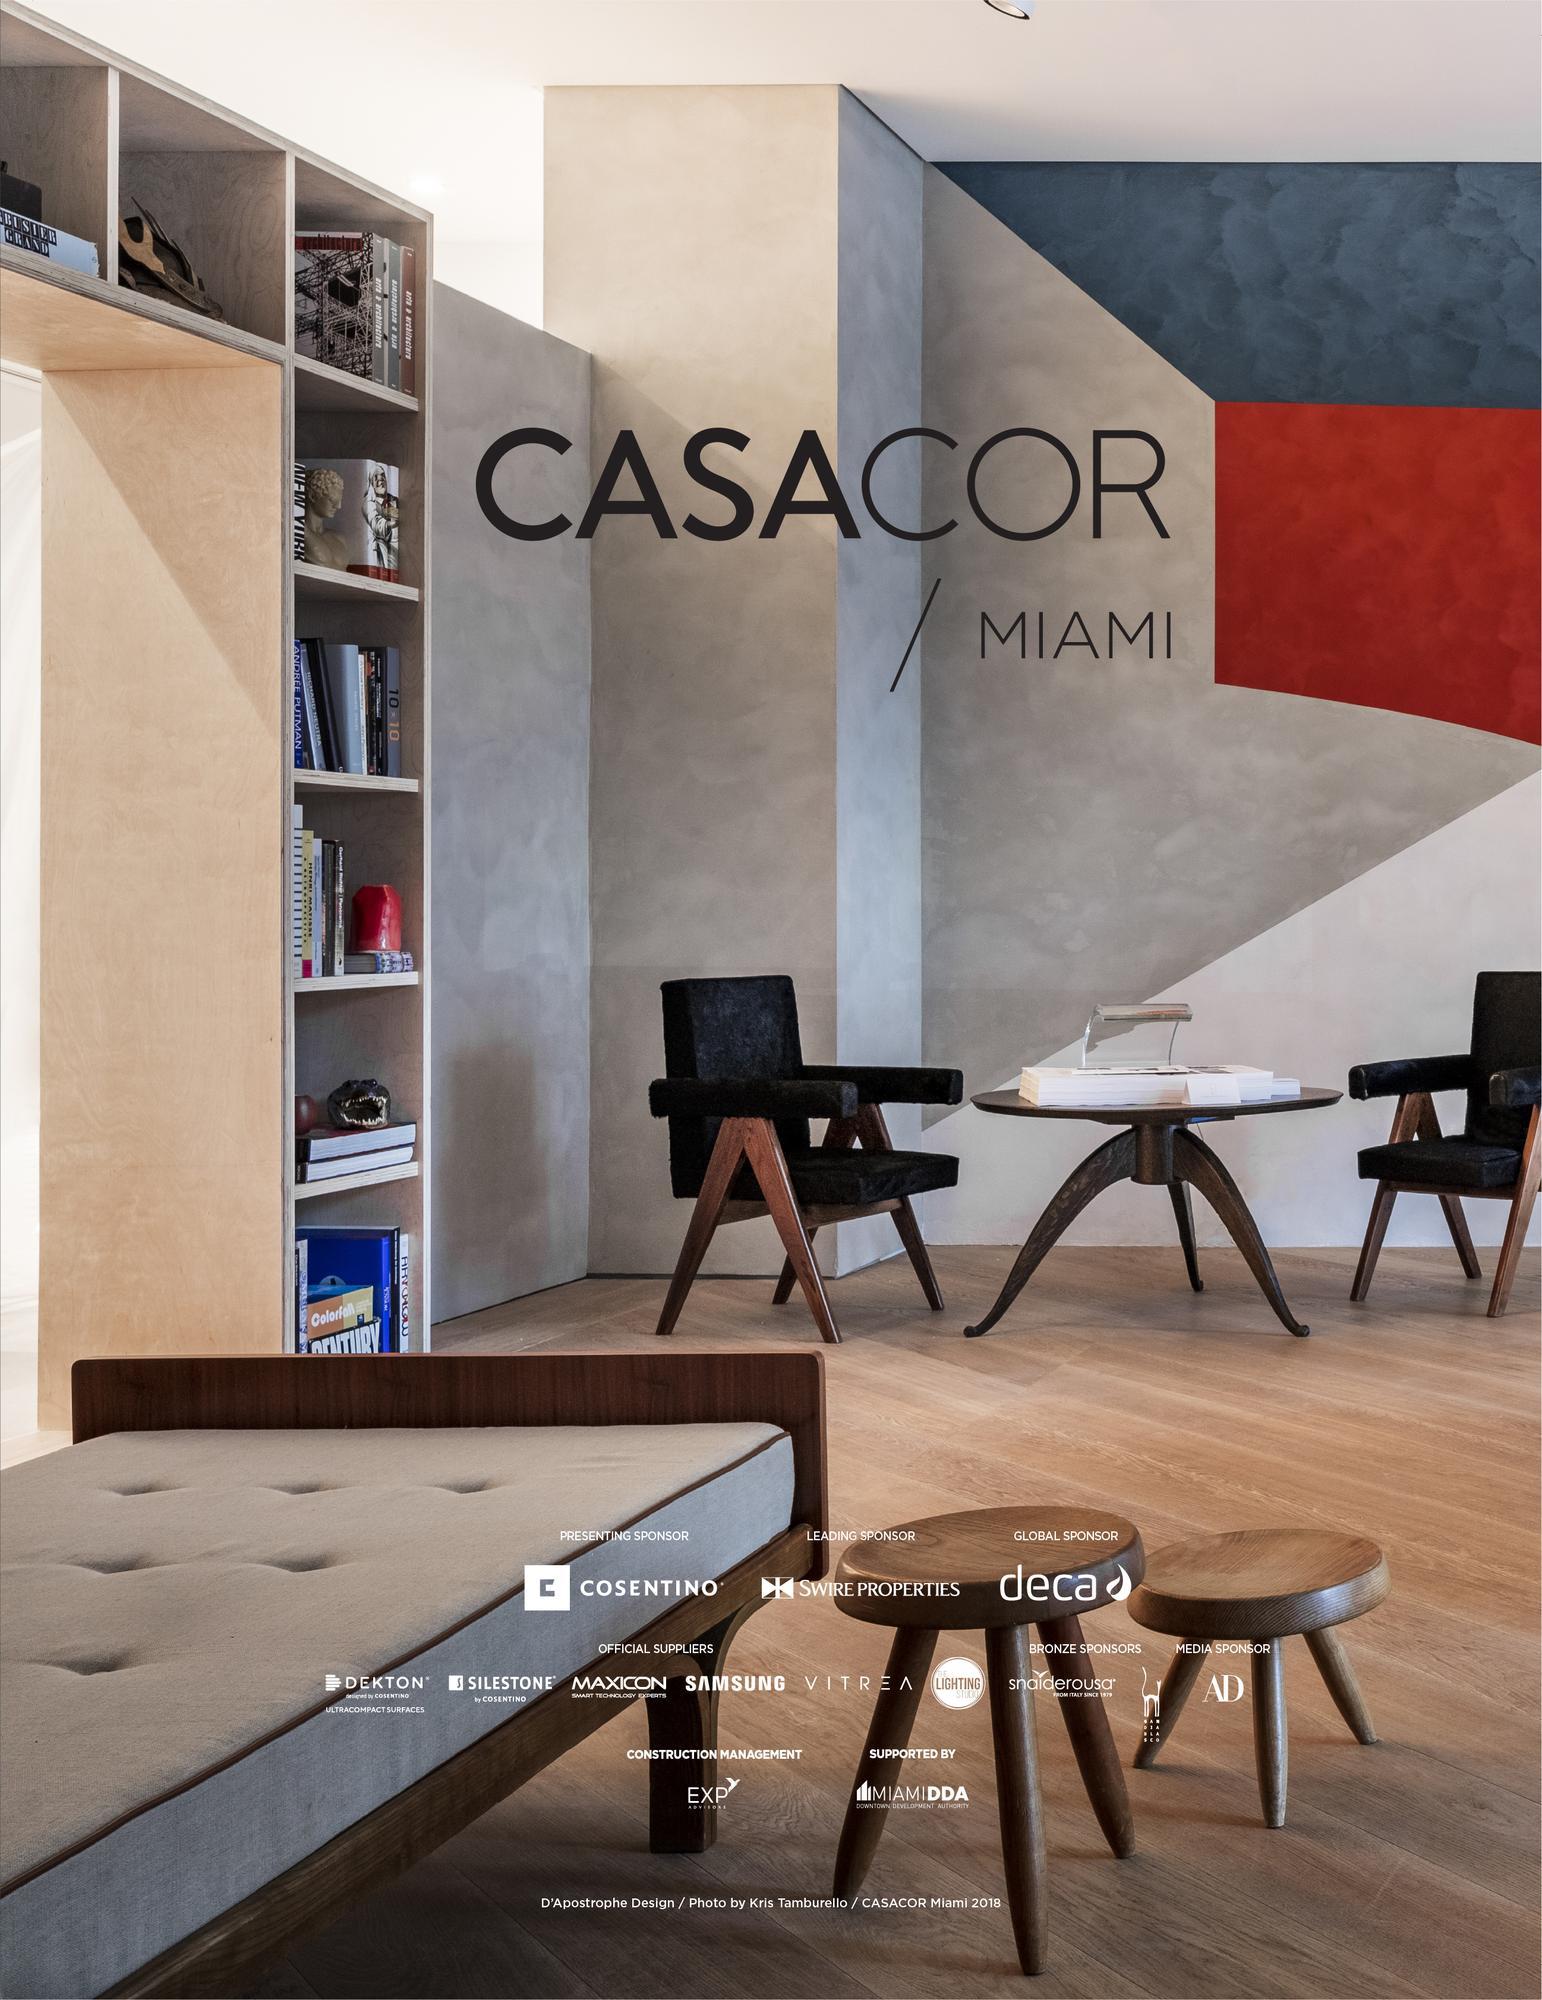 CASACOR MIAMI 2019 YODEZEEN INVITE